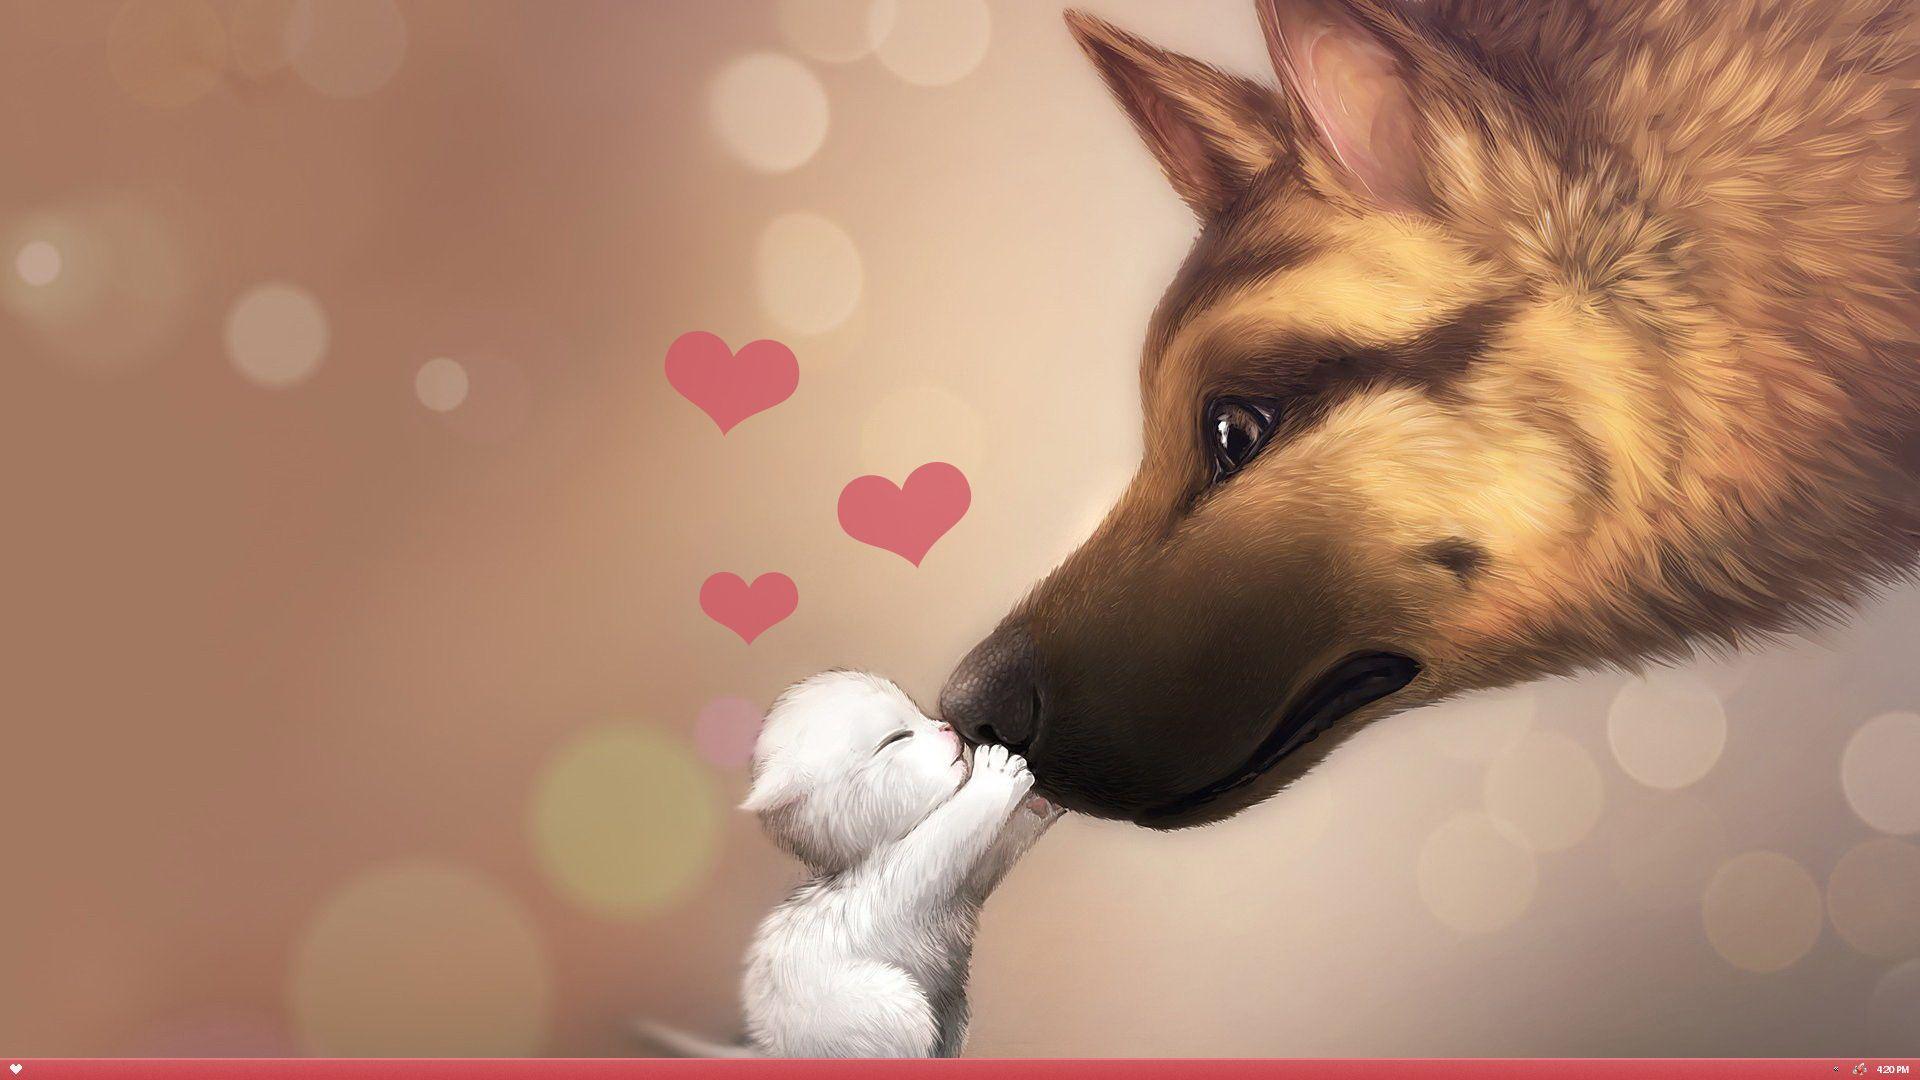 Dog Cat Love HD Wallpaper FullHDWpp   Full HD Wallpapers 1920x1080